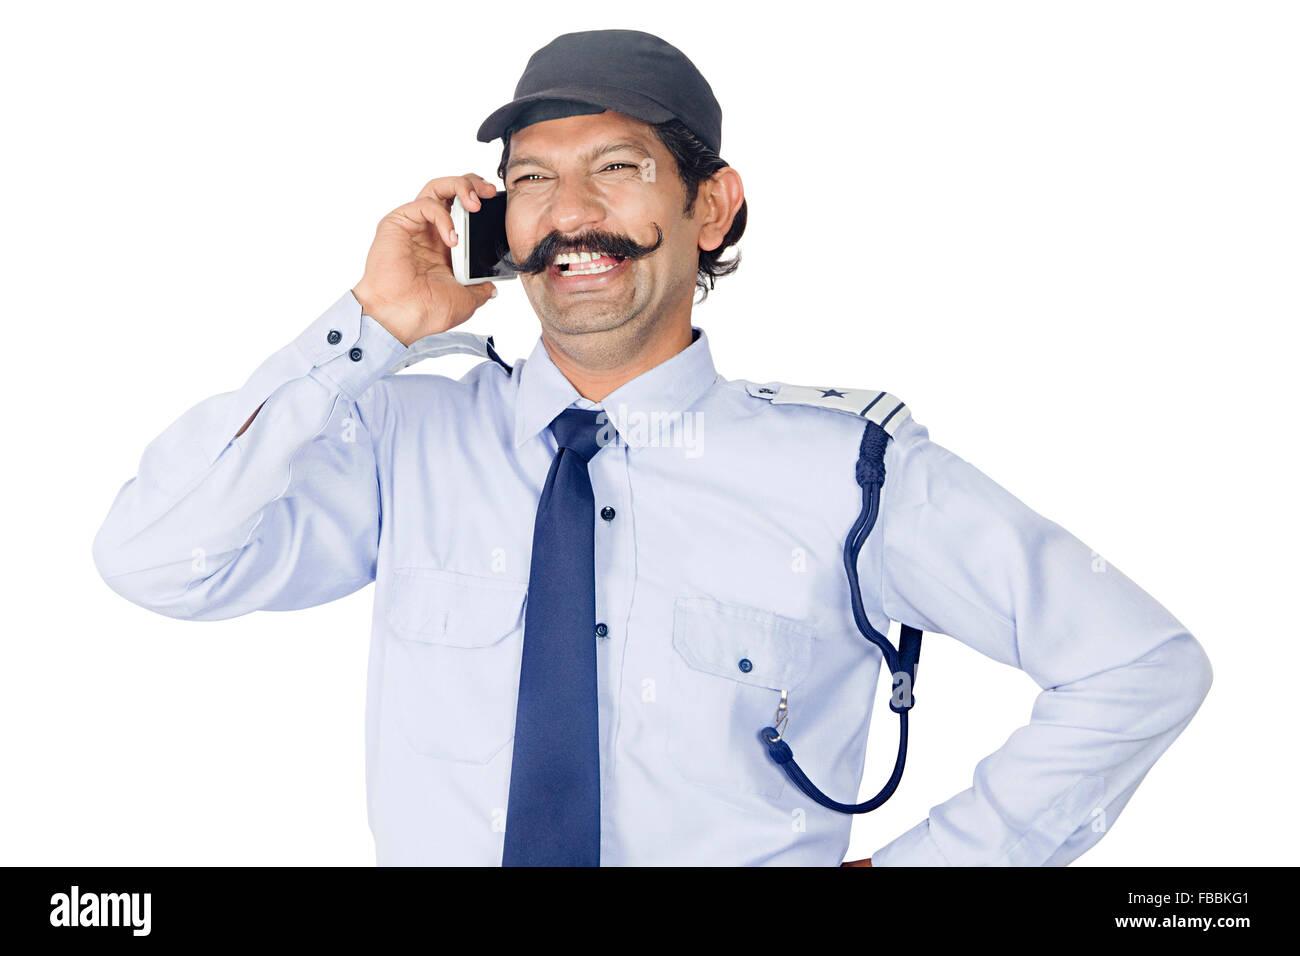 Phone Guard Security